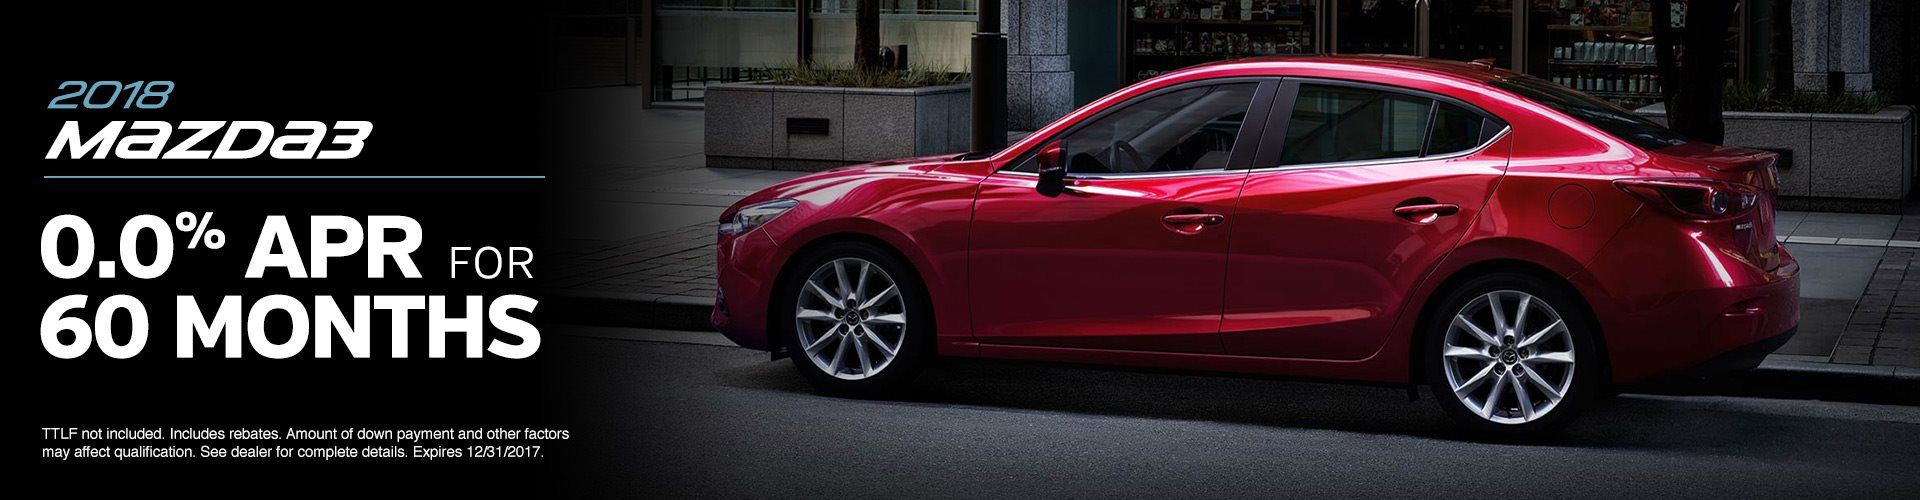 Greenway Mazda image 0